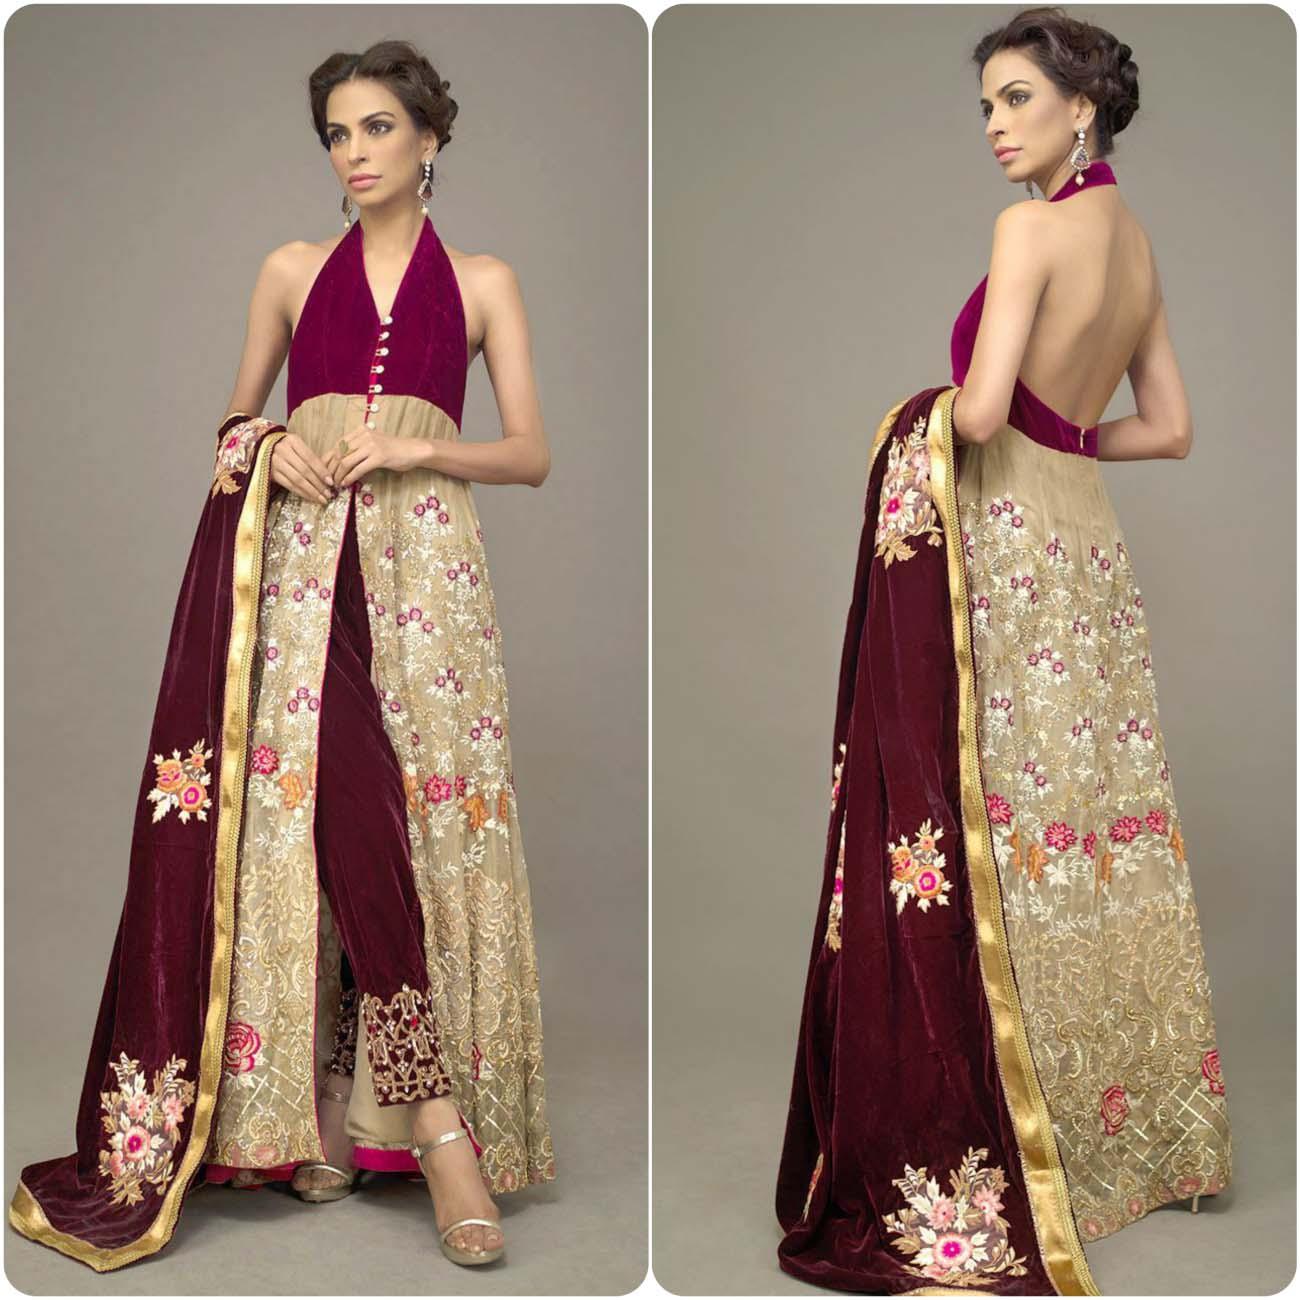 deepak perwani bridal wear collection 2106